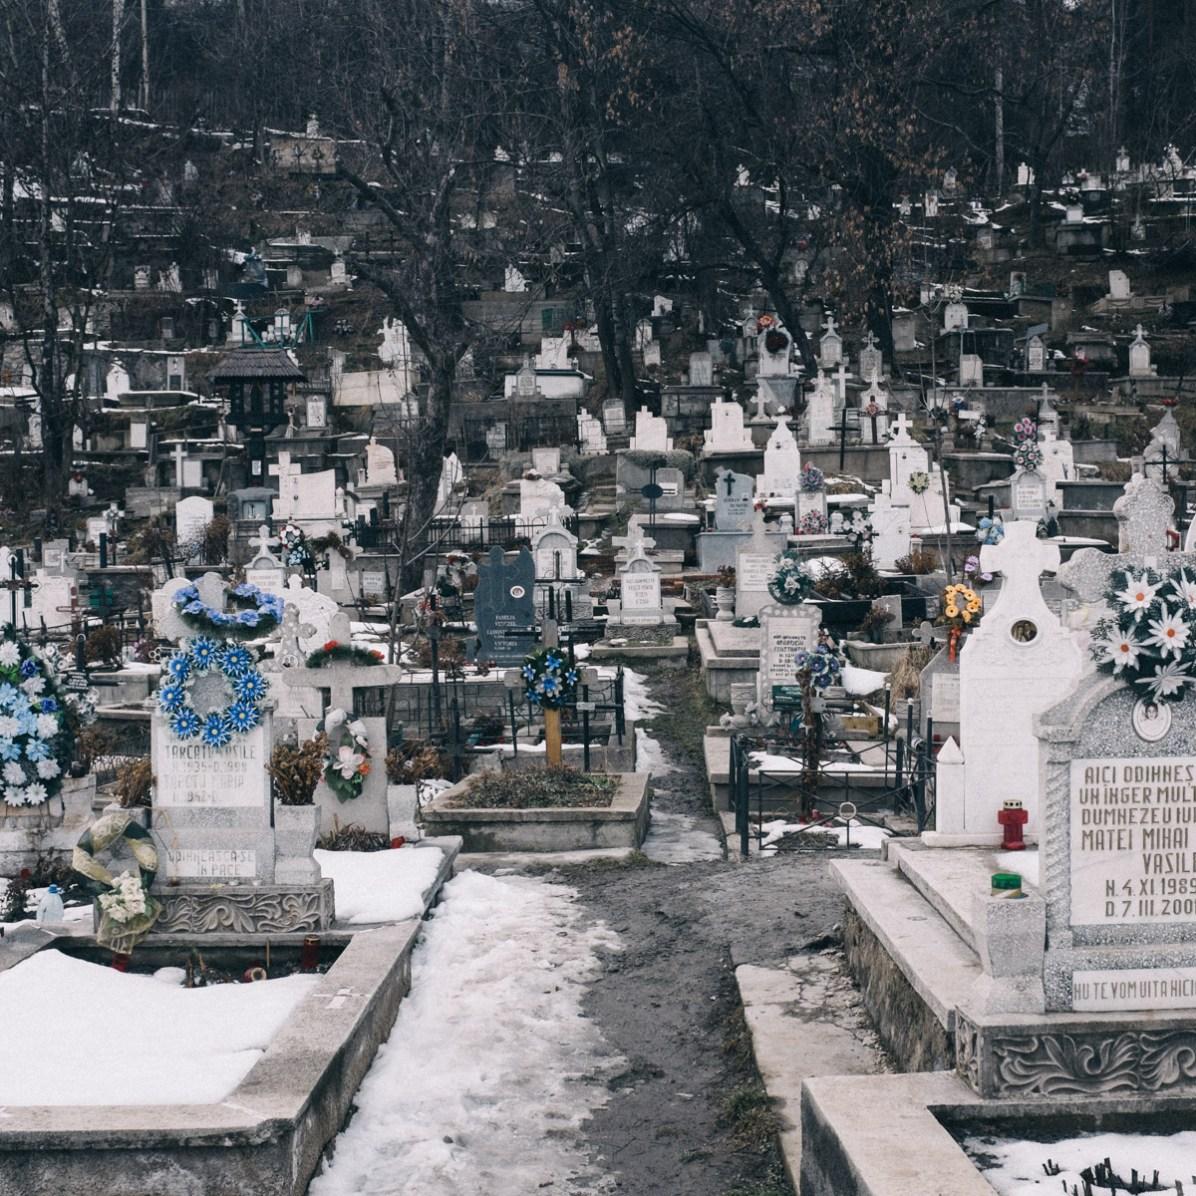 The disorderly graveyard of Petrila, Romania.